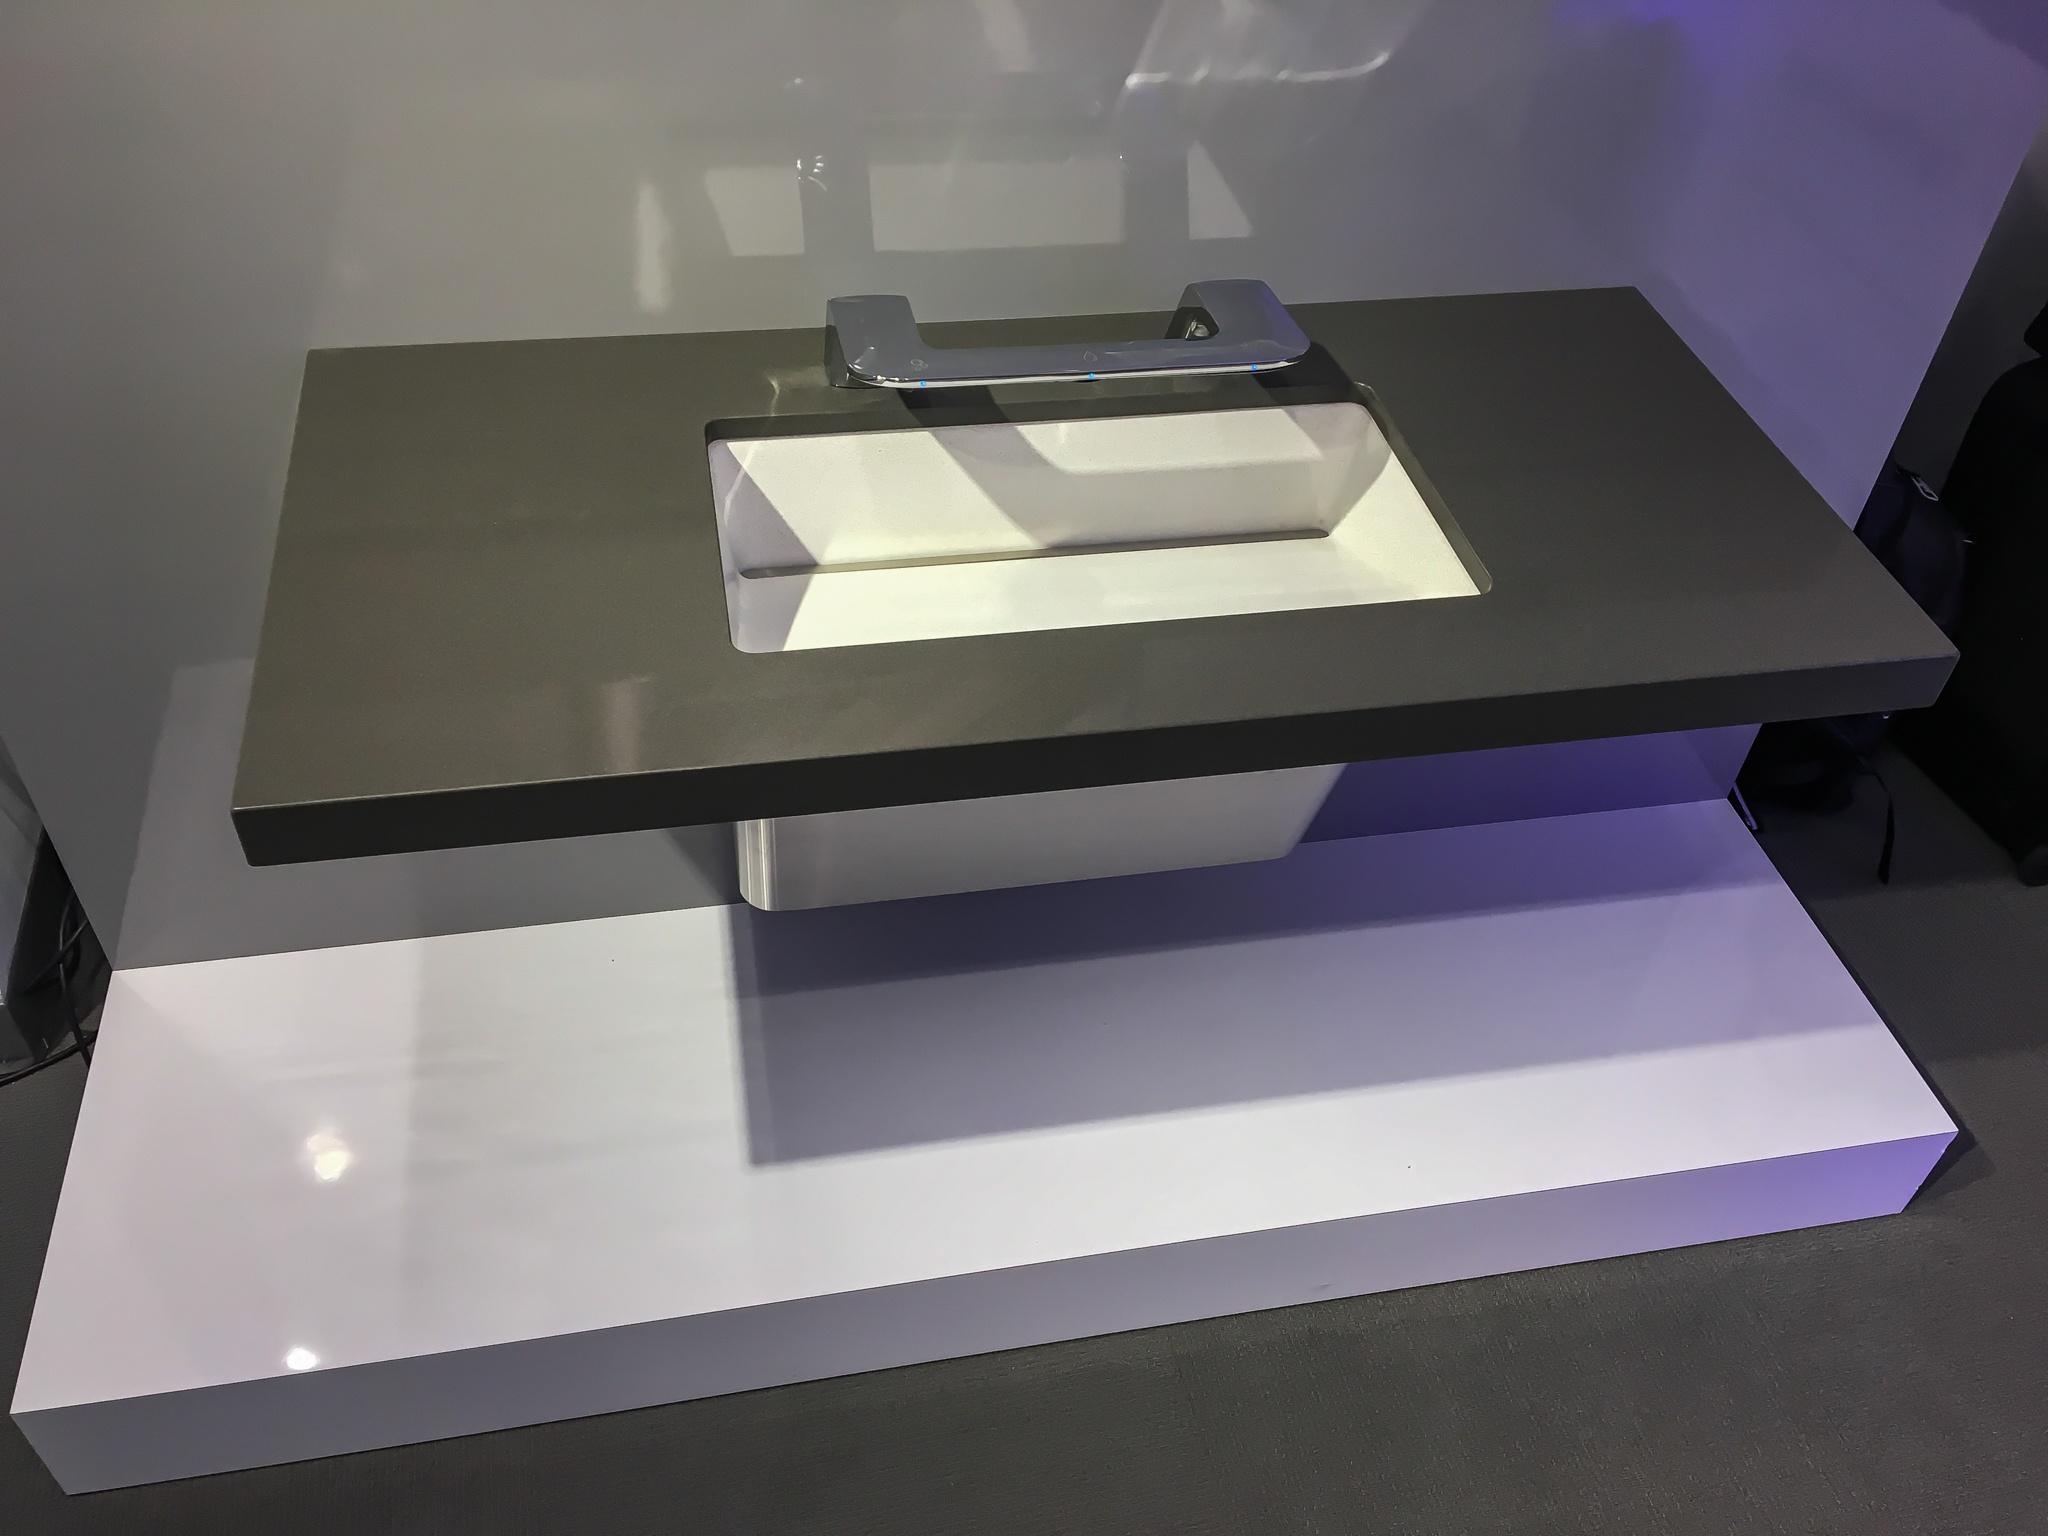 Bradley WashBar LD5010 Lavatory-Sink System Providing Enhanced Reach